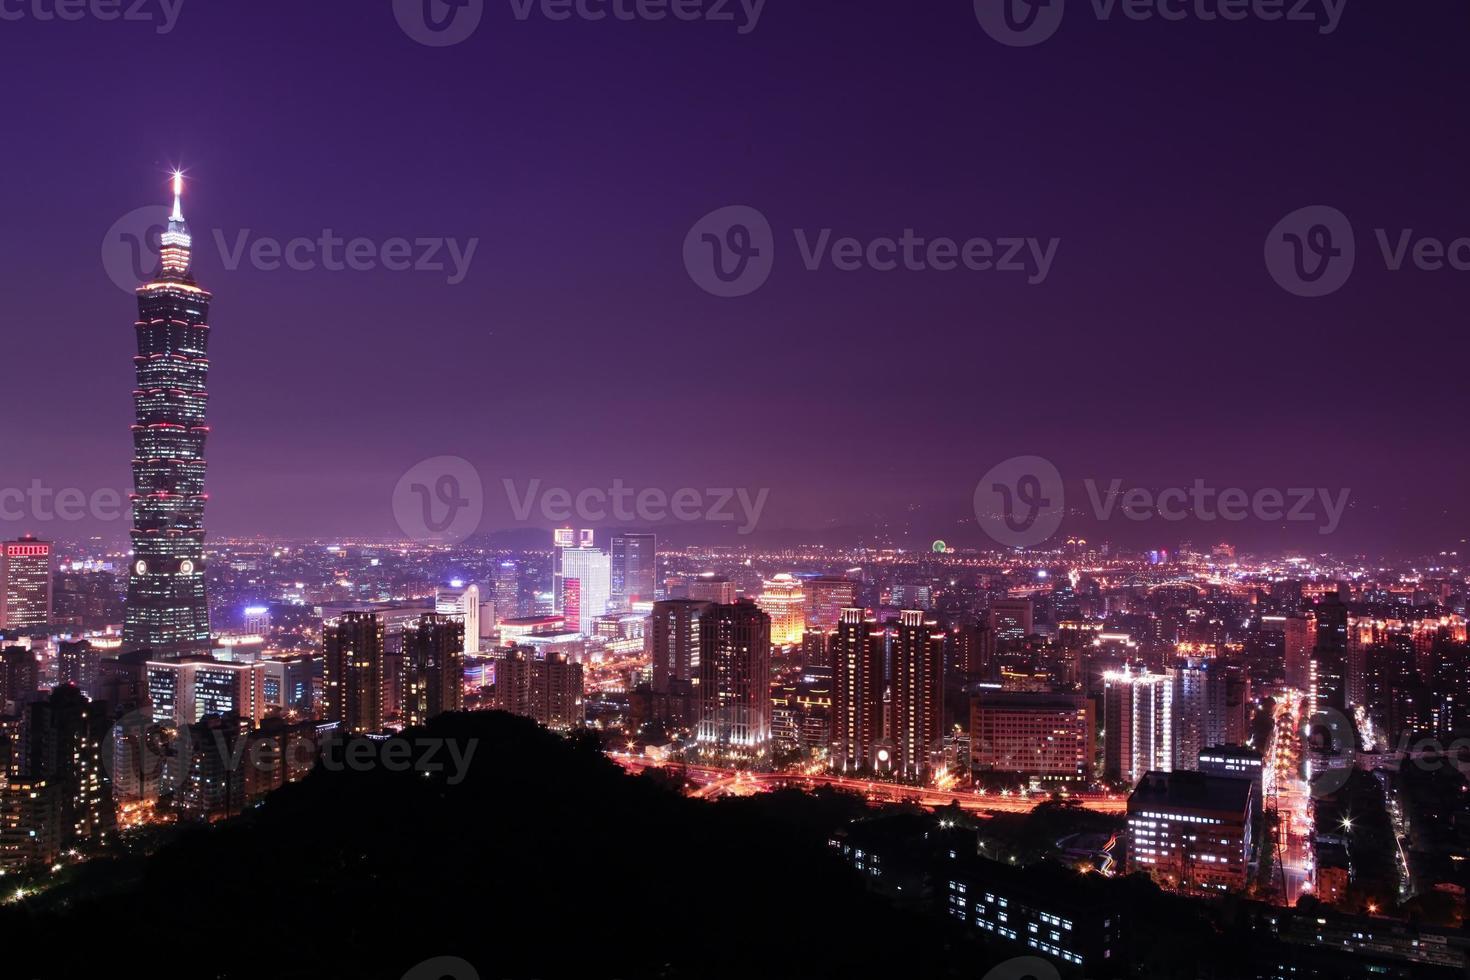 taipei, taiwán noche encantadora foto